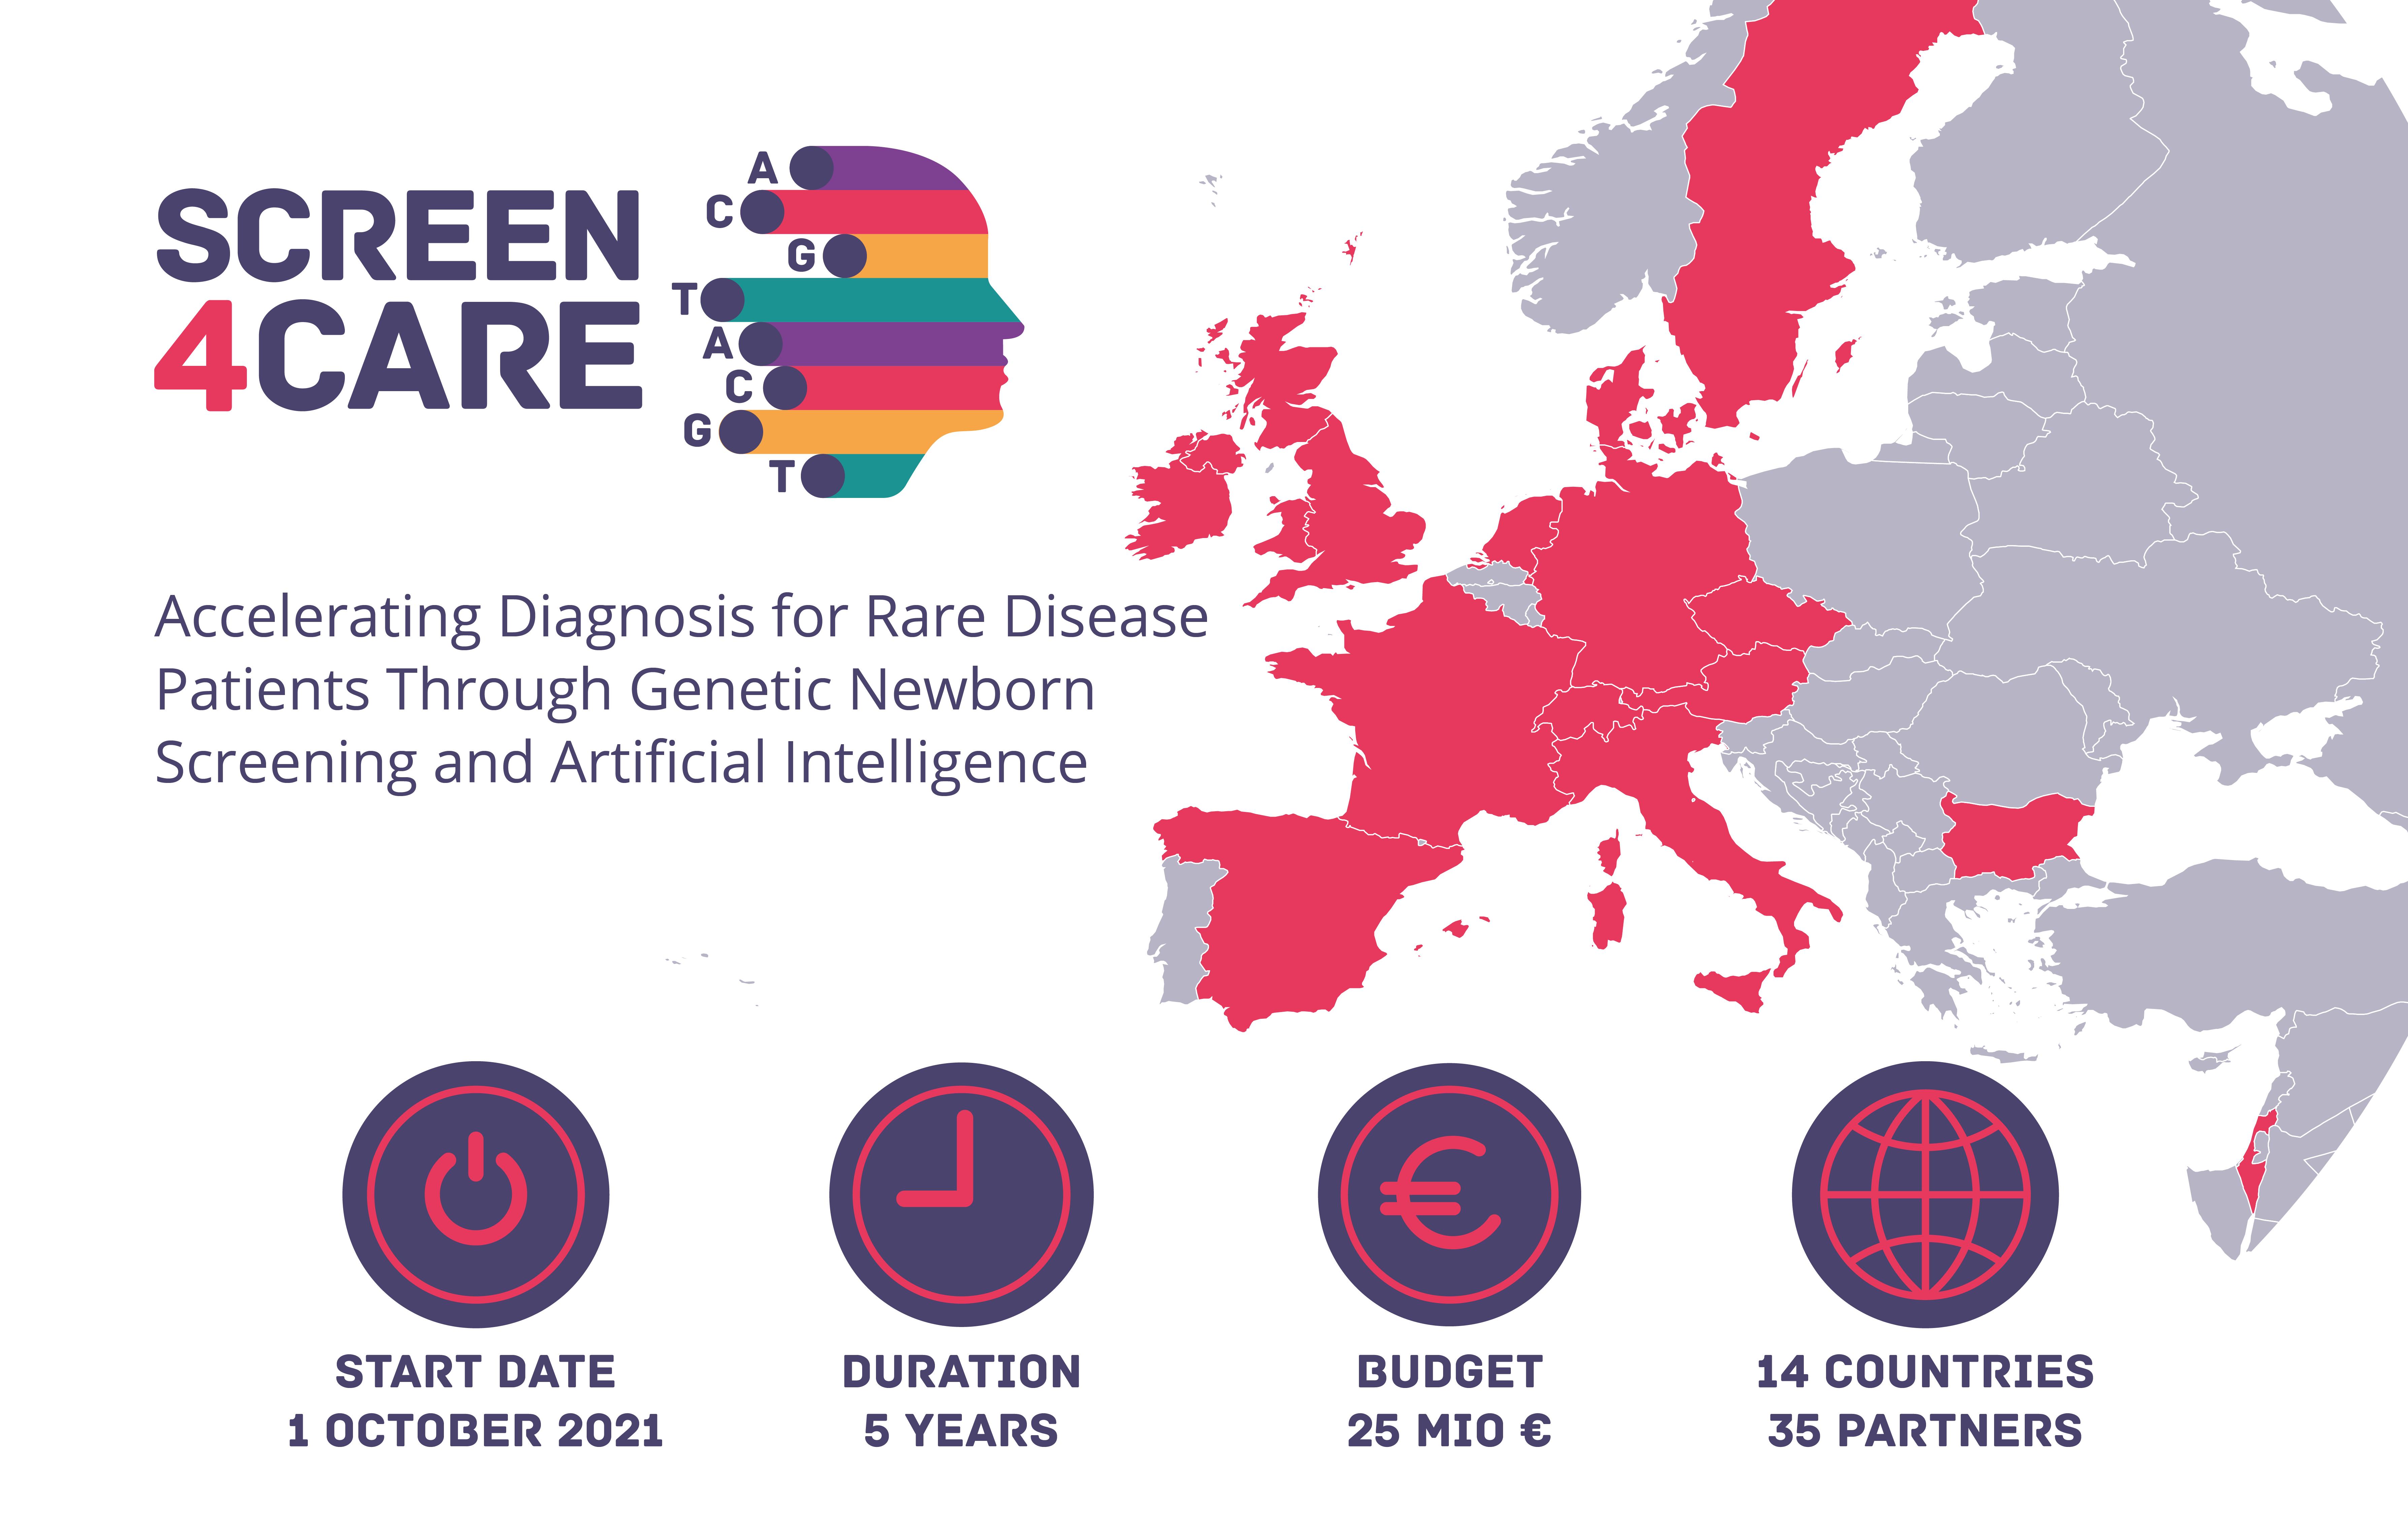 LBG Open Innovation in Science Center ist Teil des neuen EU-Forschungsprojekts